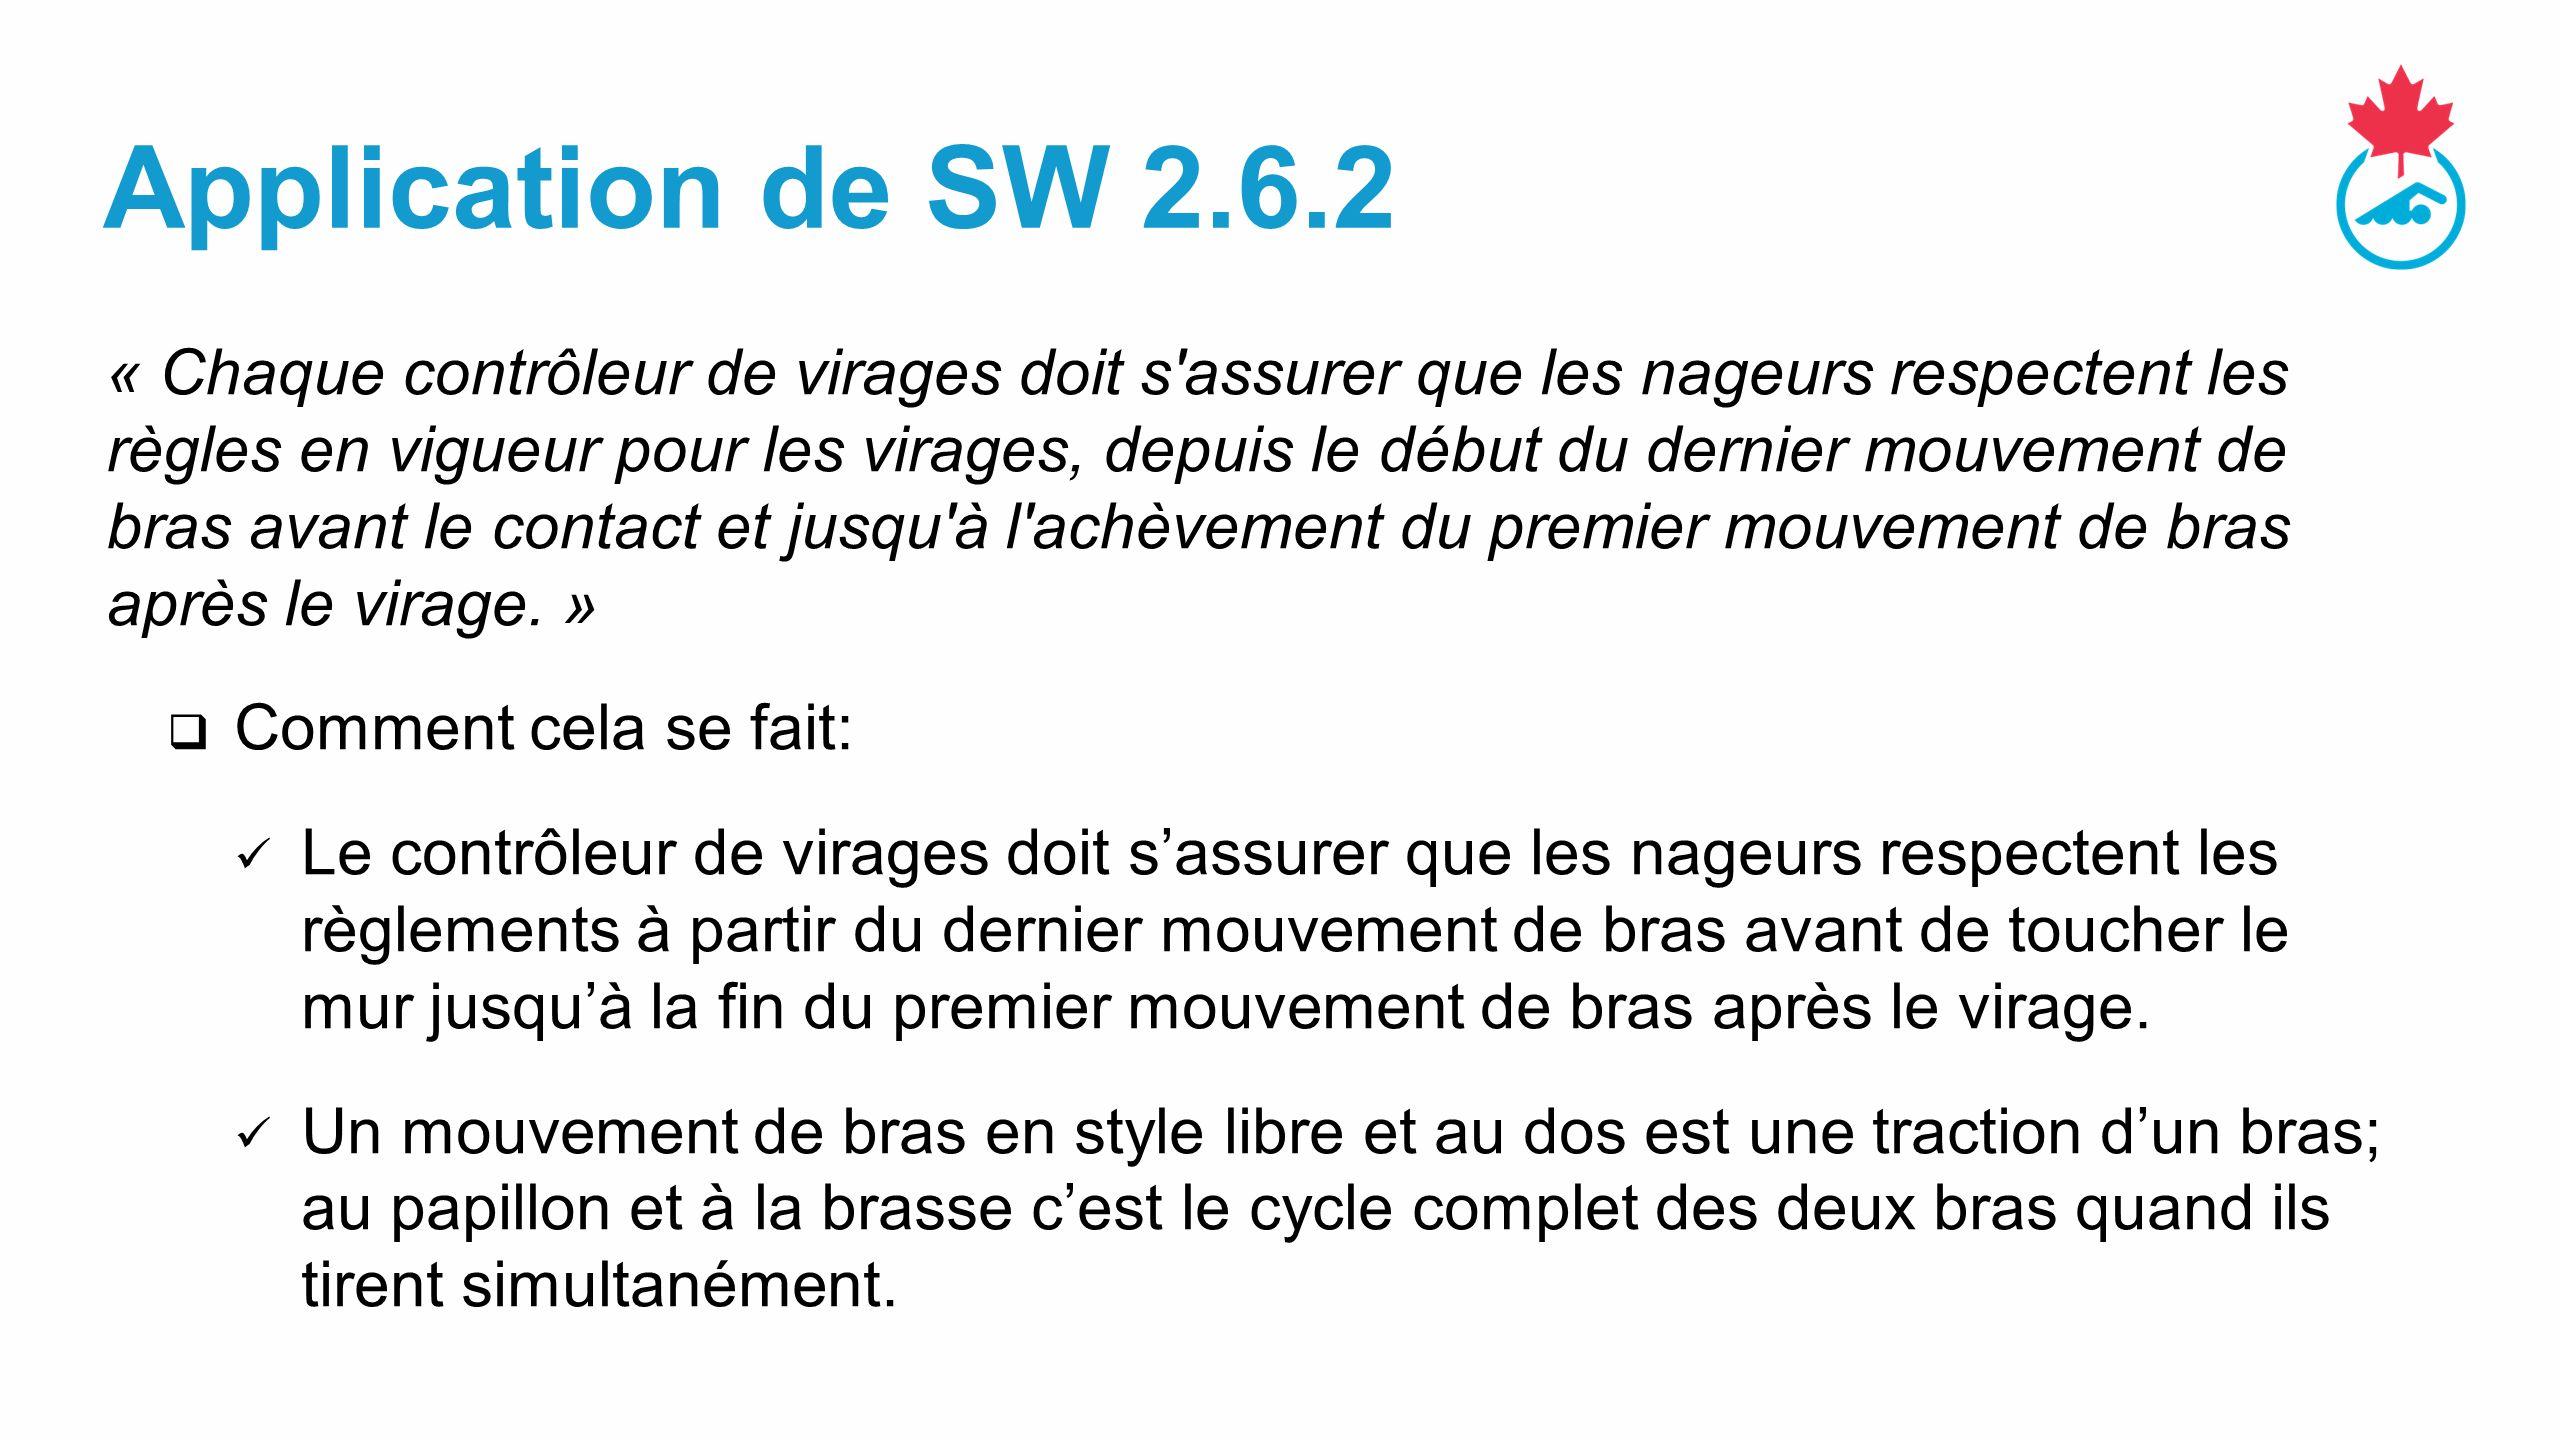 Application de SW 2.6.2